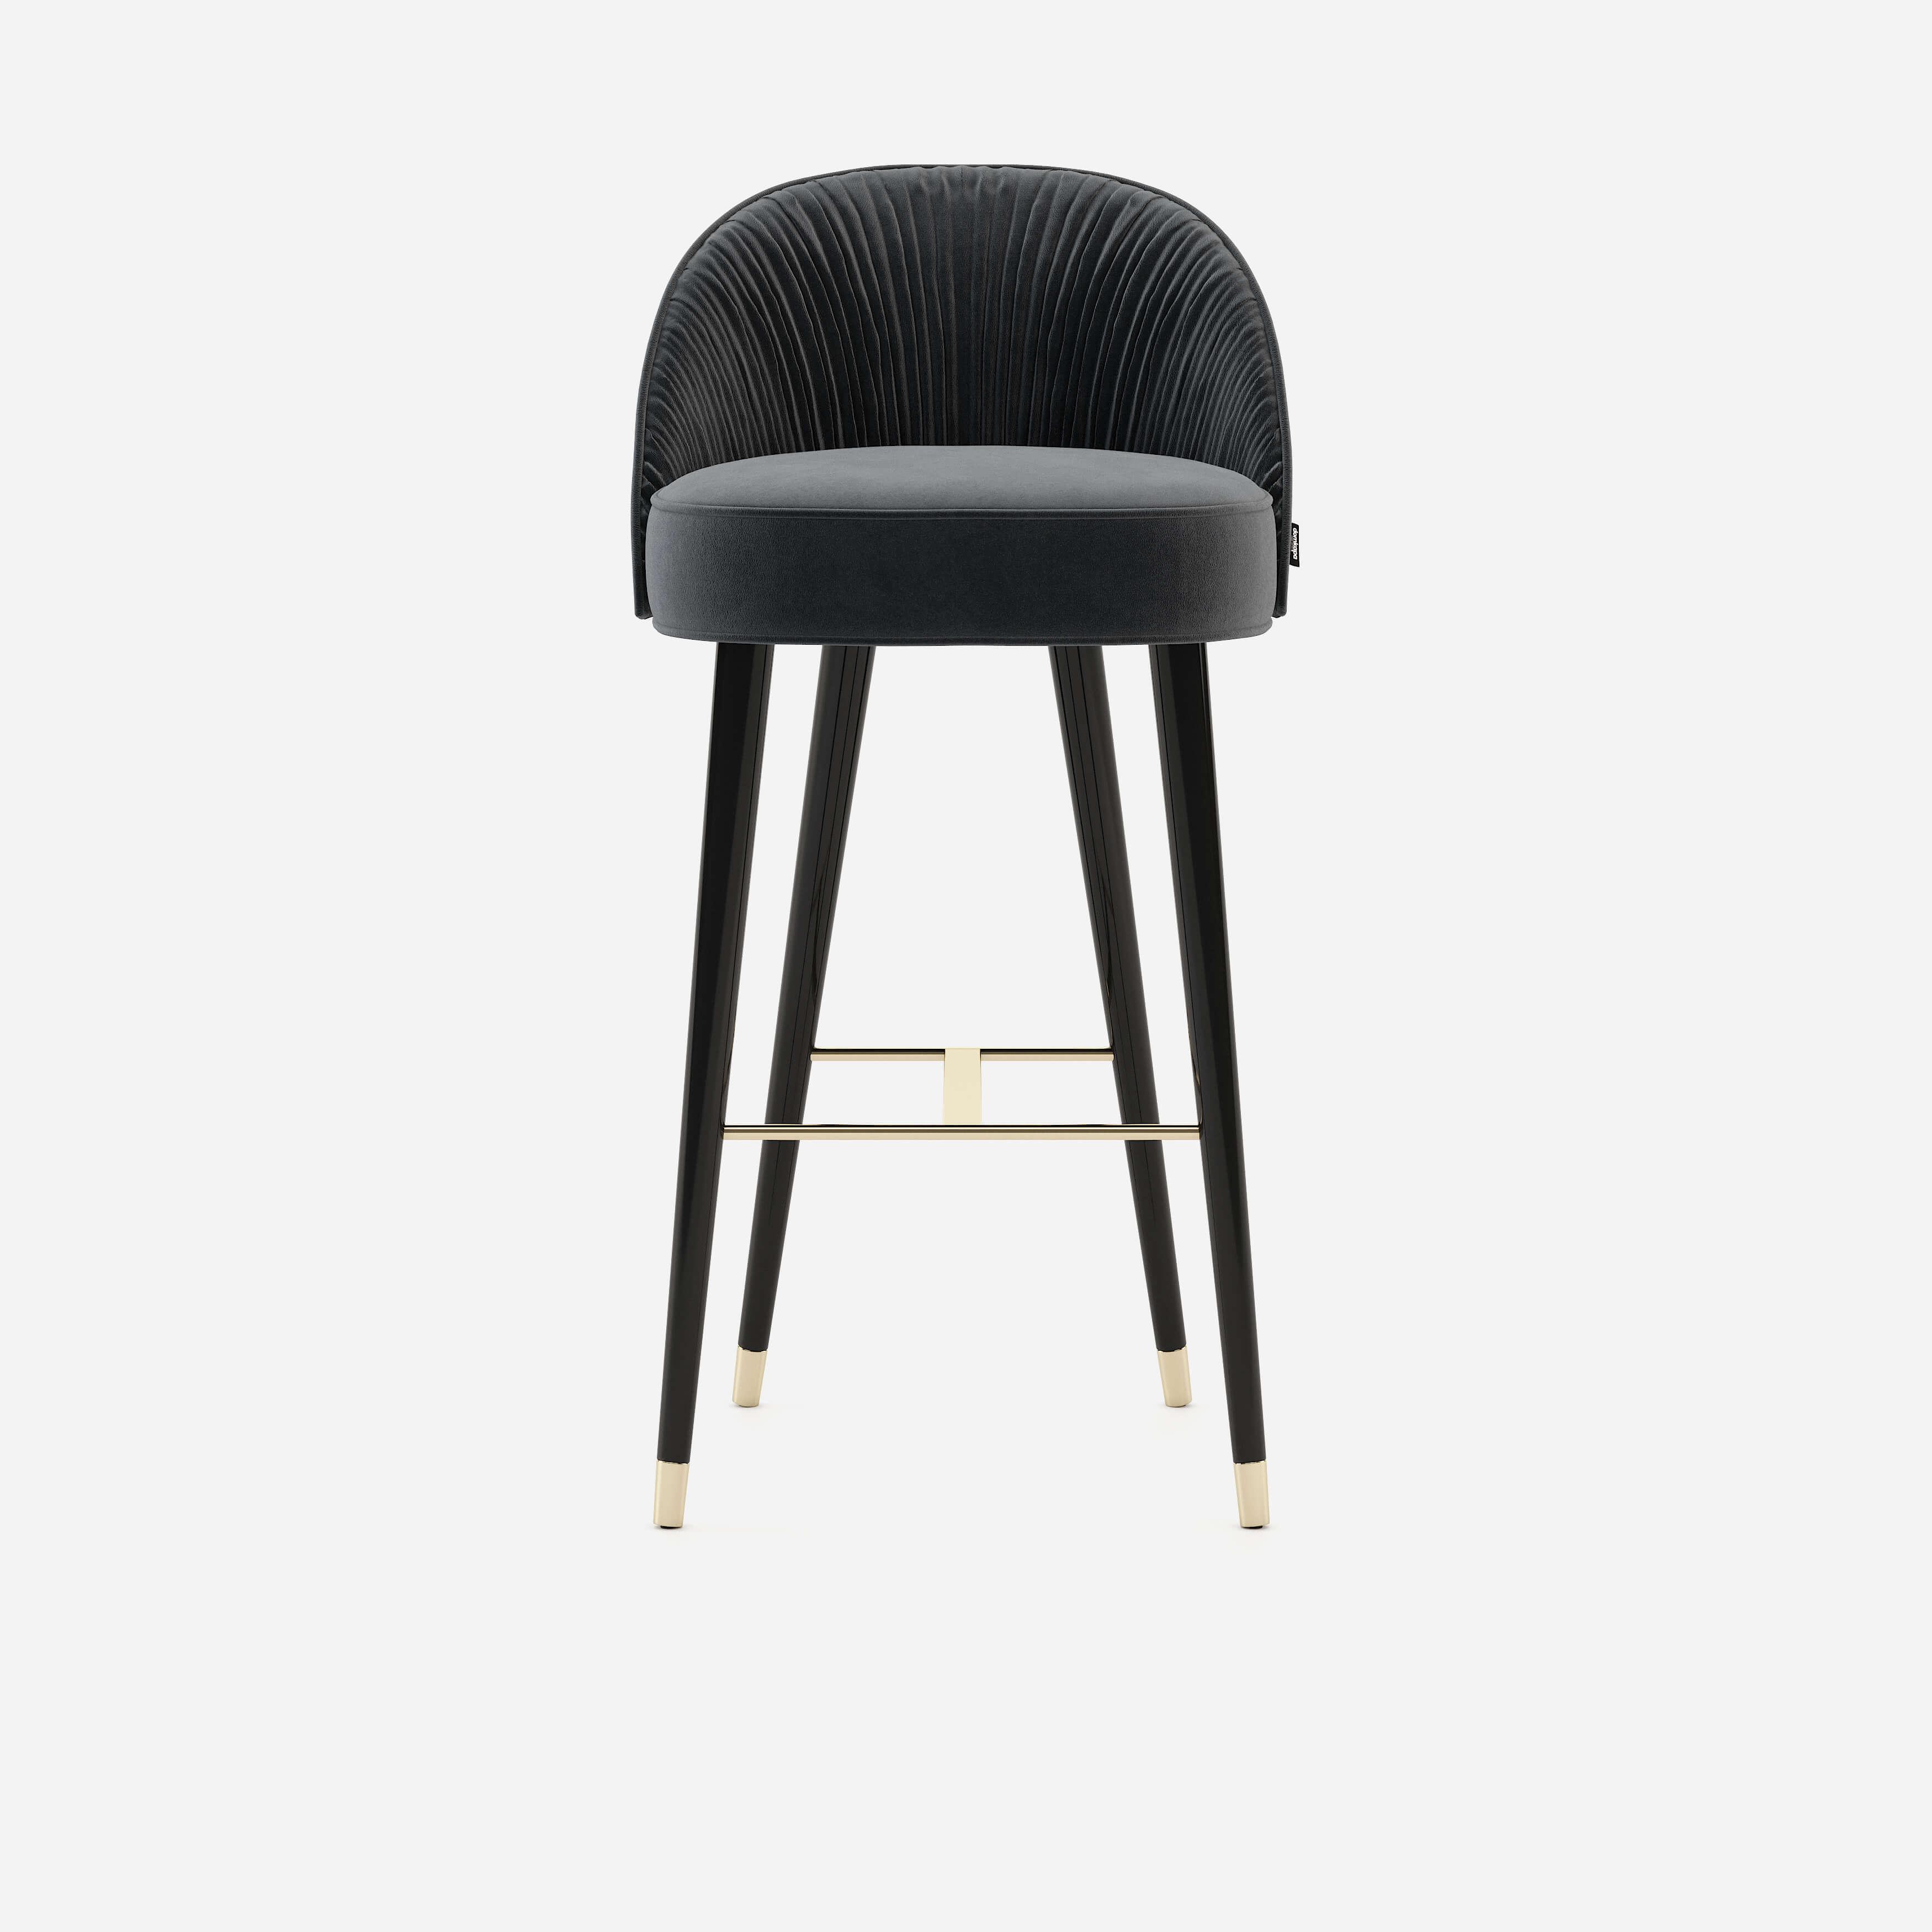 camille-cadeira-de-bar-domkapa-upholstery-velvet-contract-hospitality-hotal-design-projects-bar-chair-2